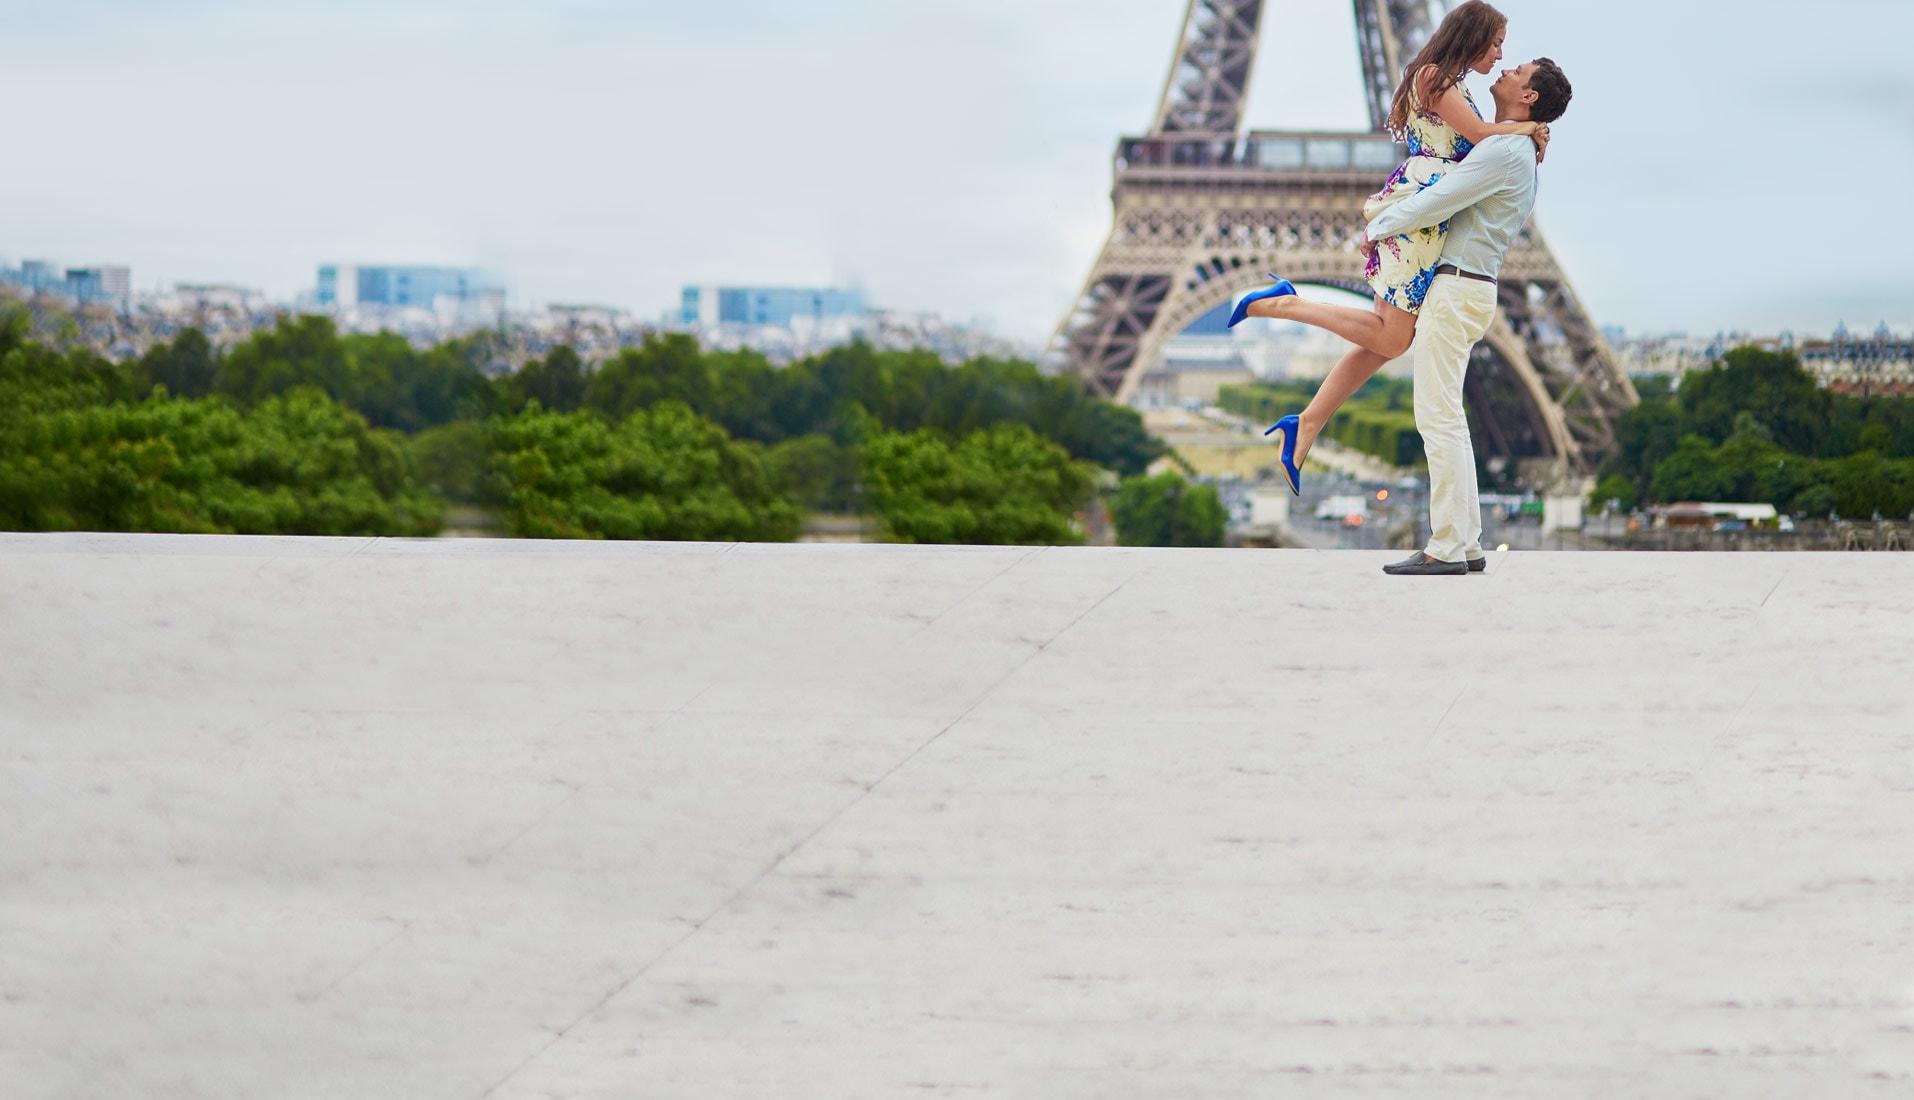 OneTravel.com: Up to $30 off Travel Deals to Europe